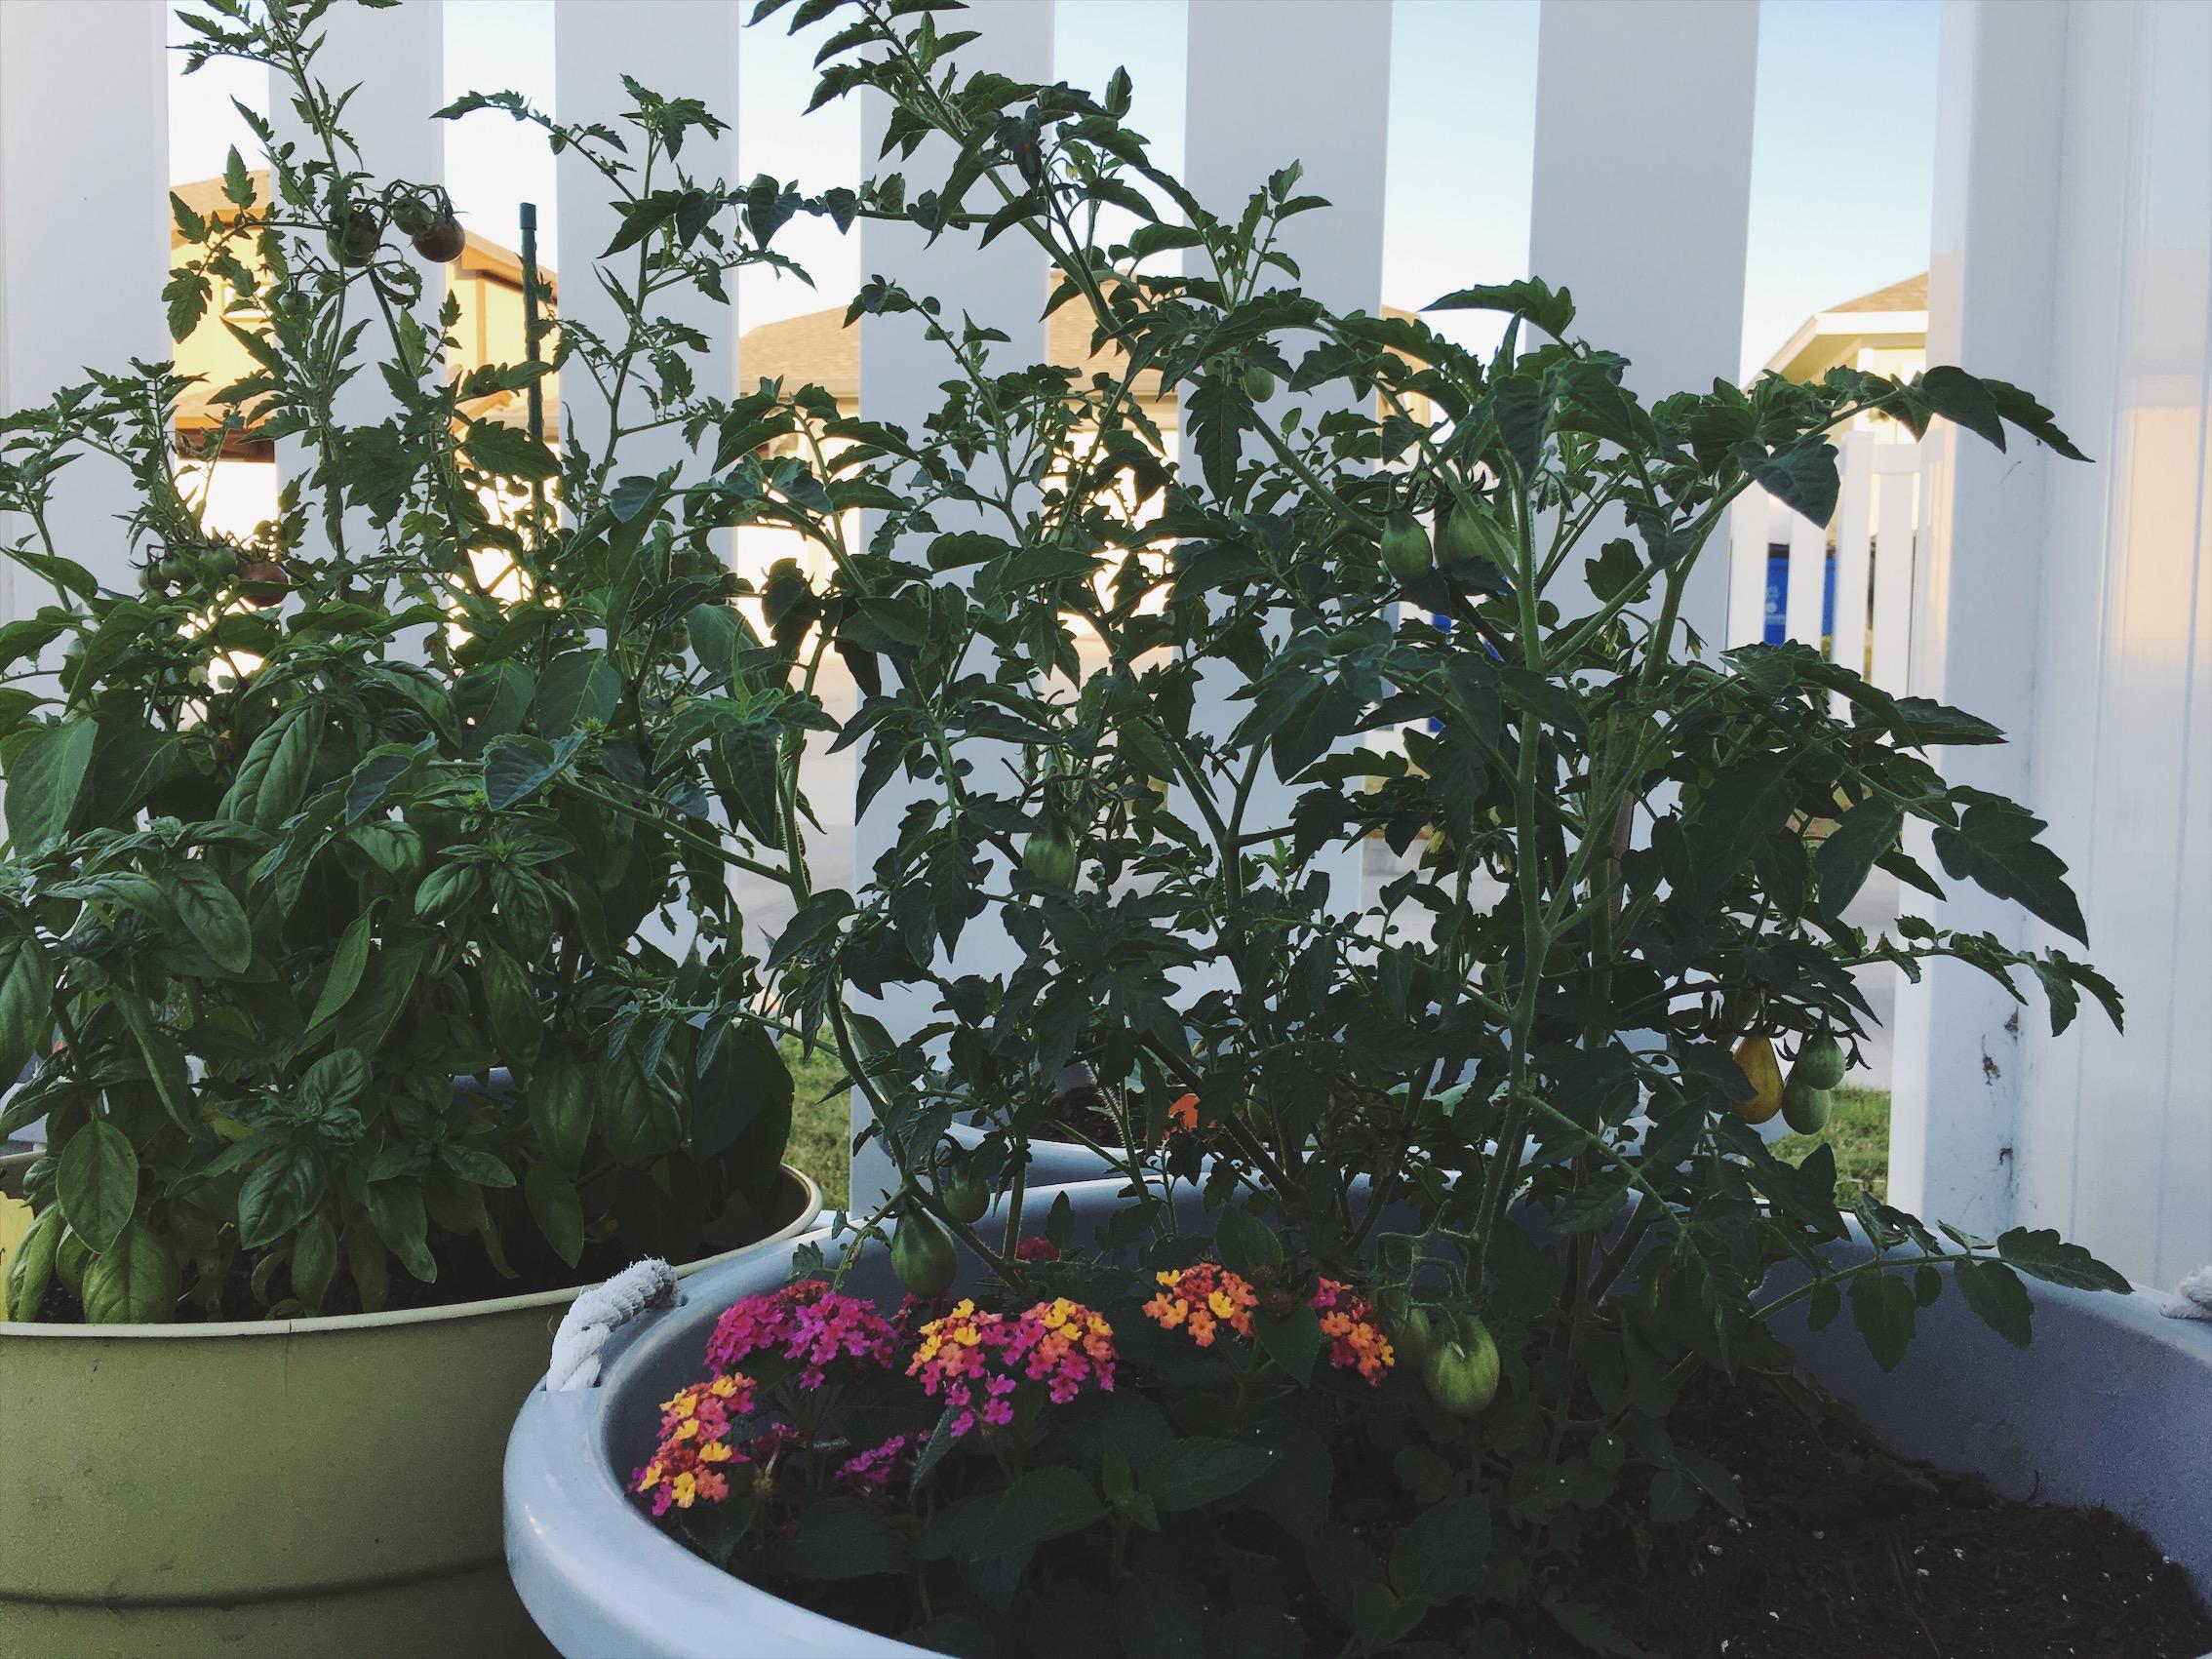 The happier, healthier, non-dead plants of Season 2!